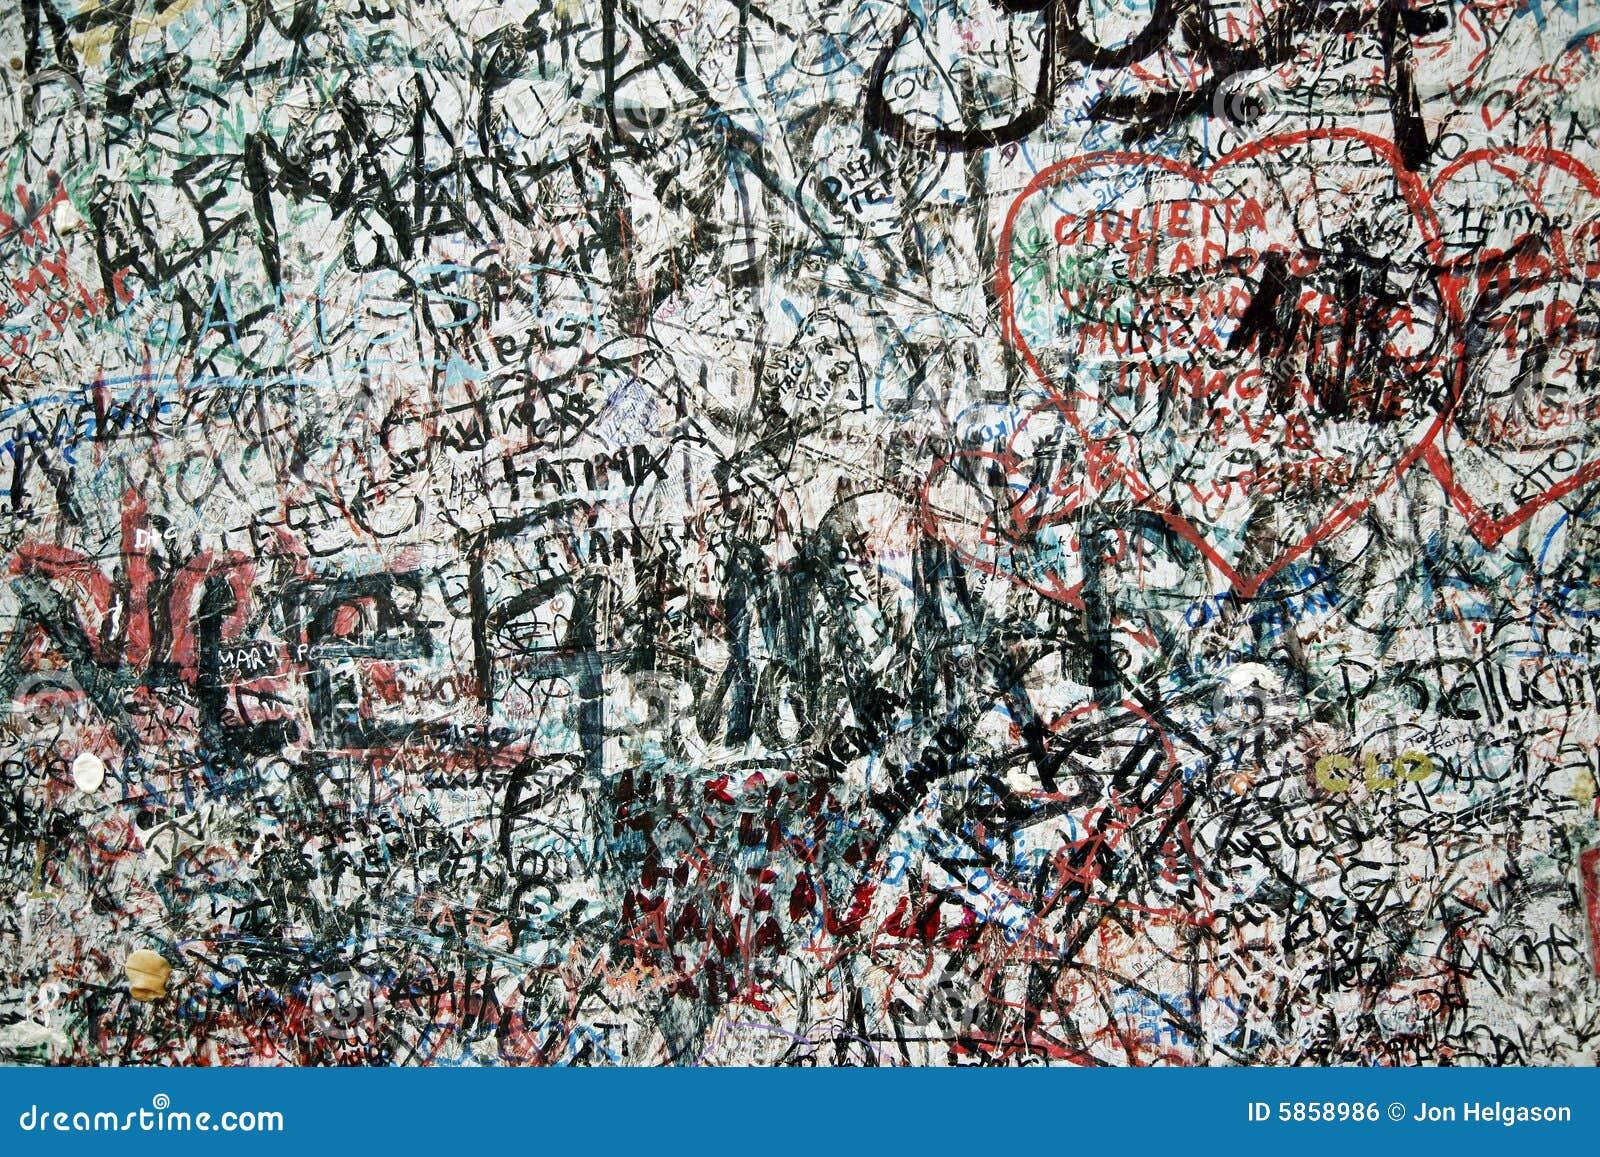 grafitti the art of vandalism essay